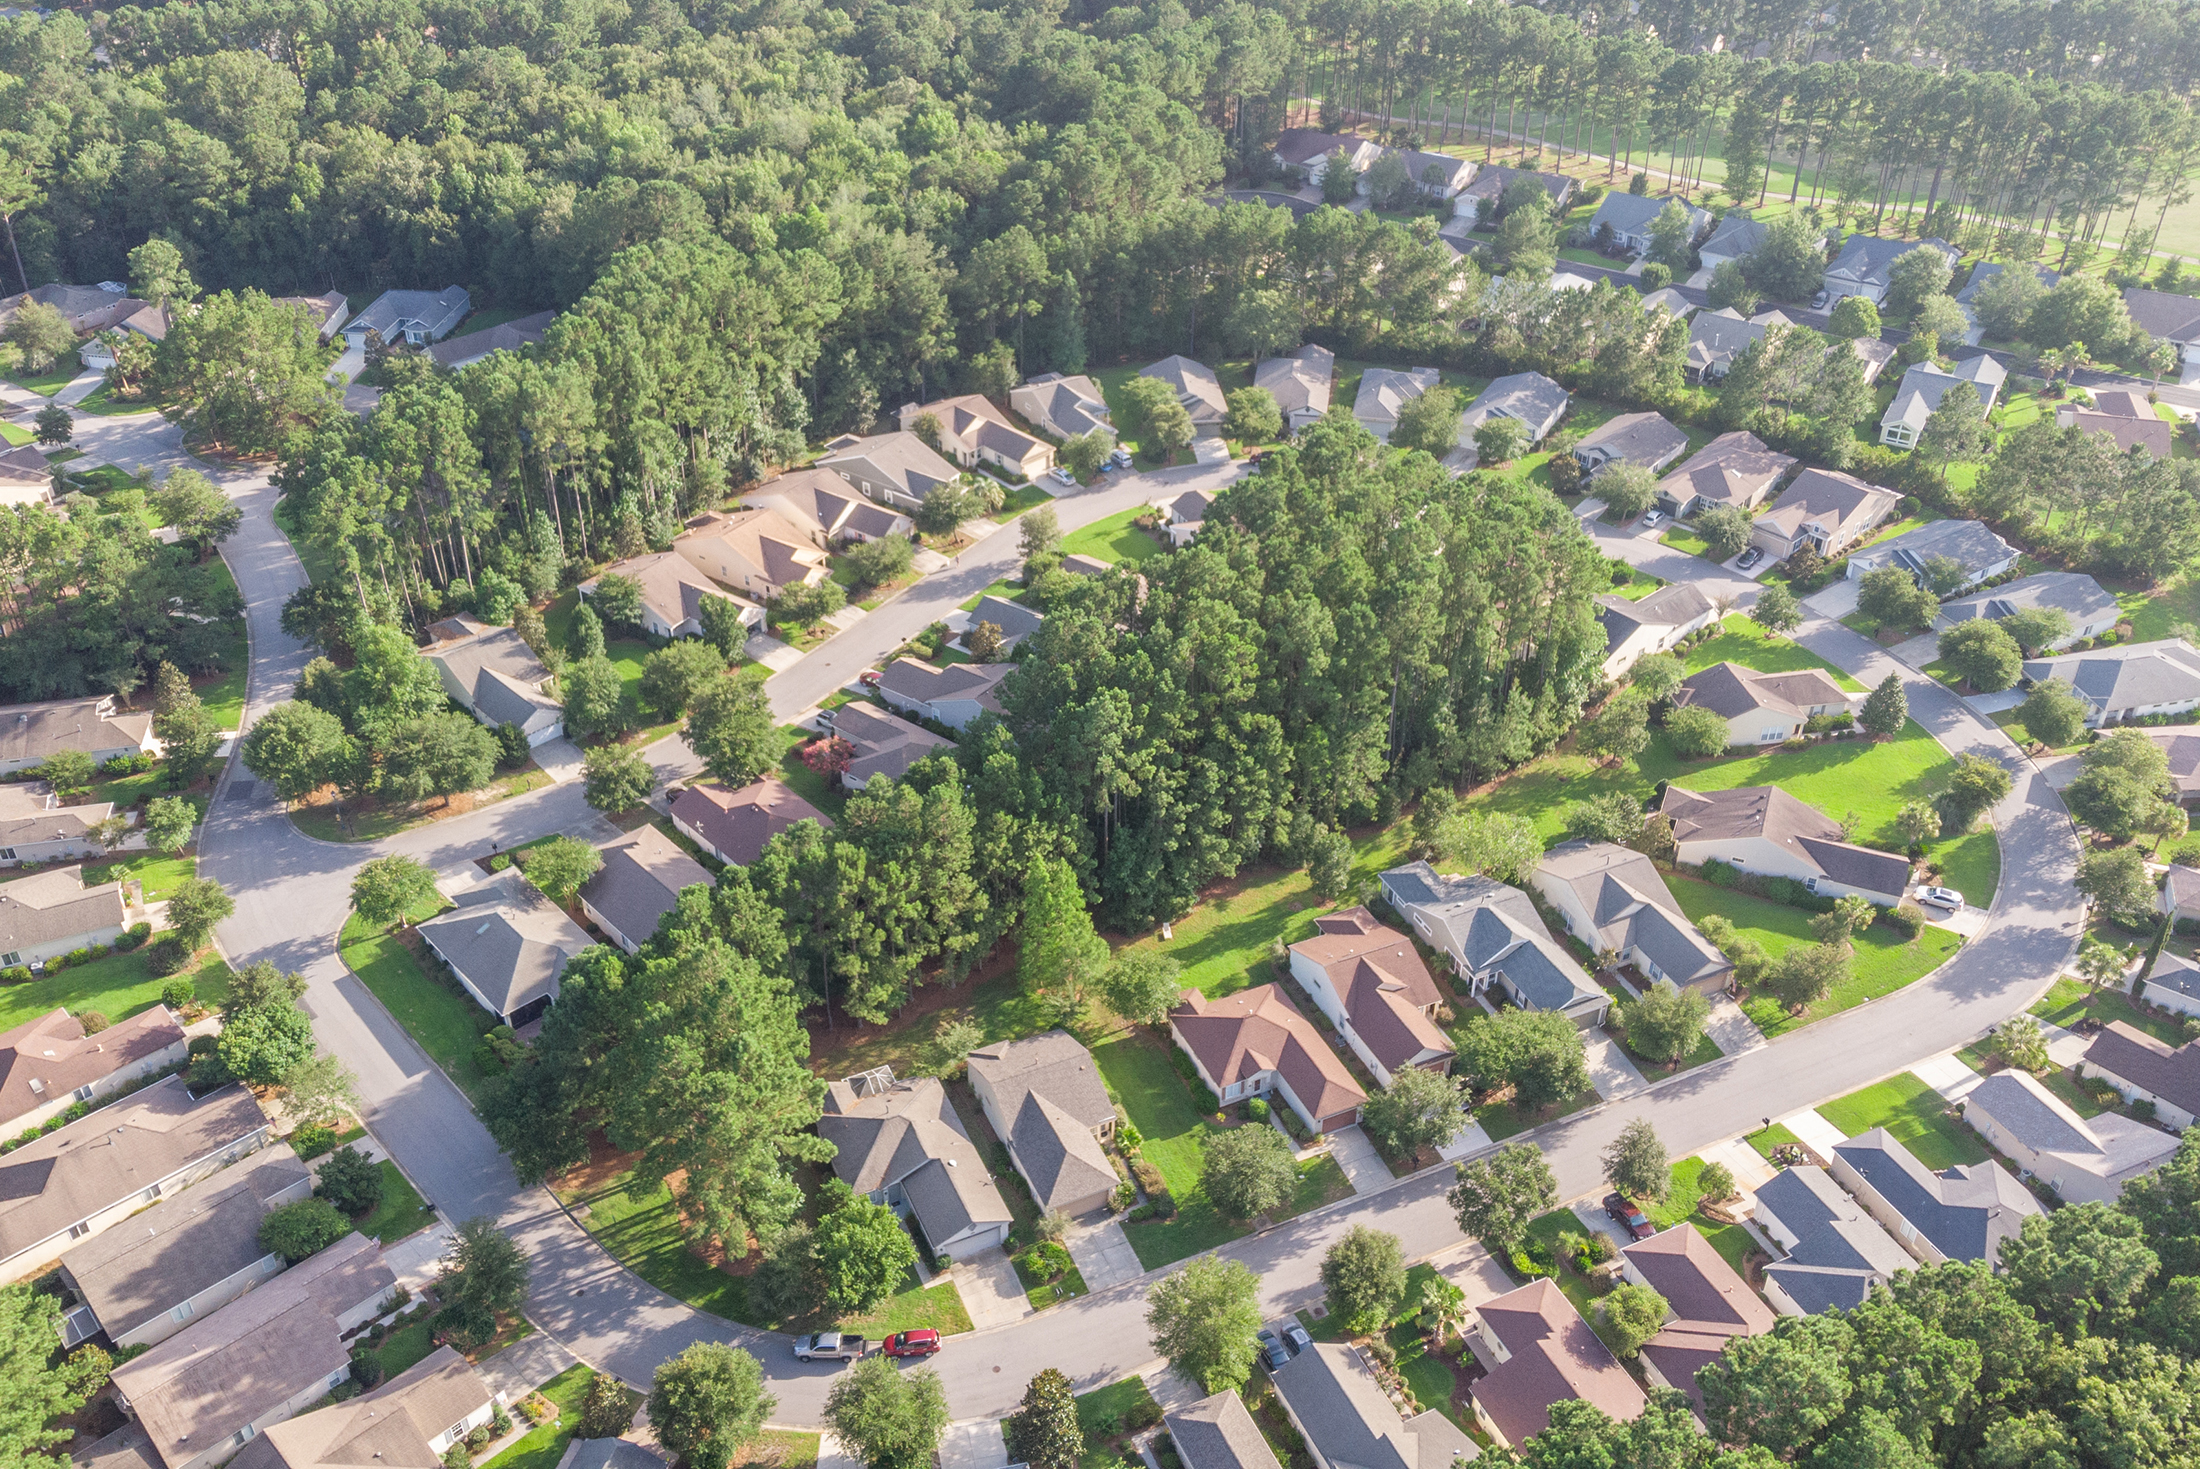 Real Estate, Sun City Hilton Head, Homes, Bluffton, Okatie, SC, 29909